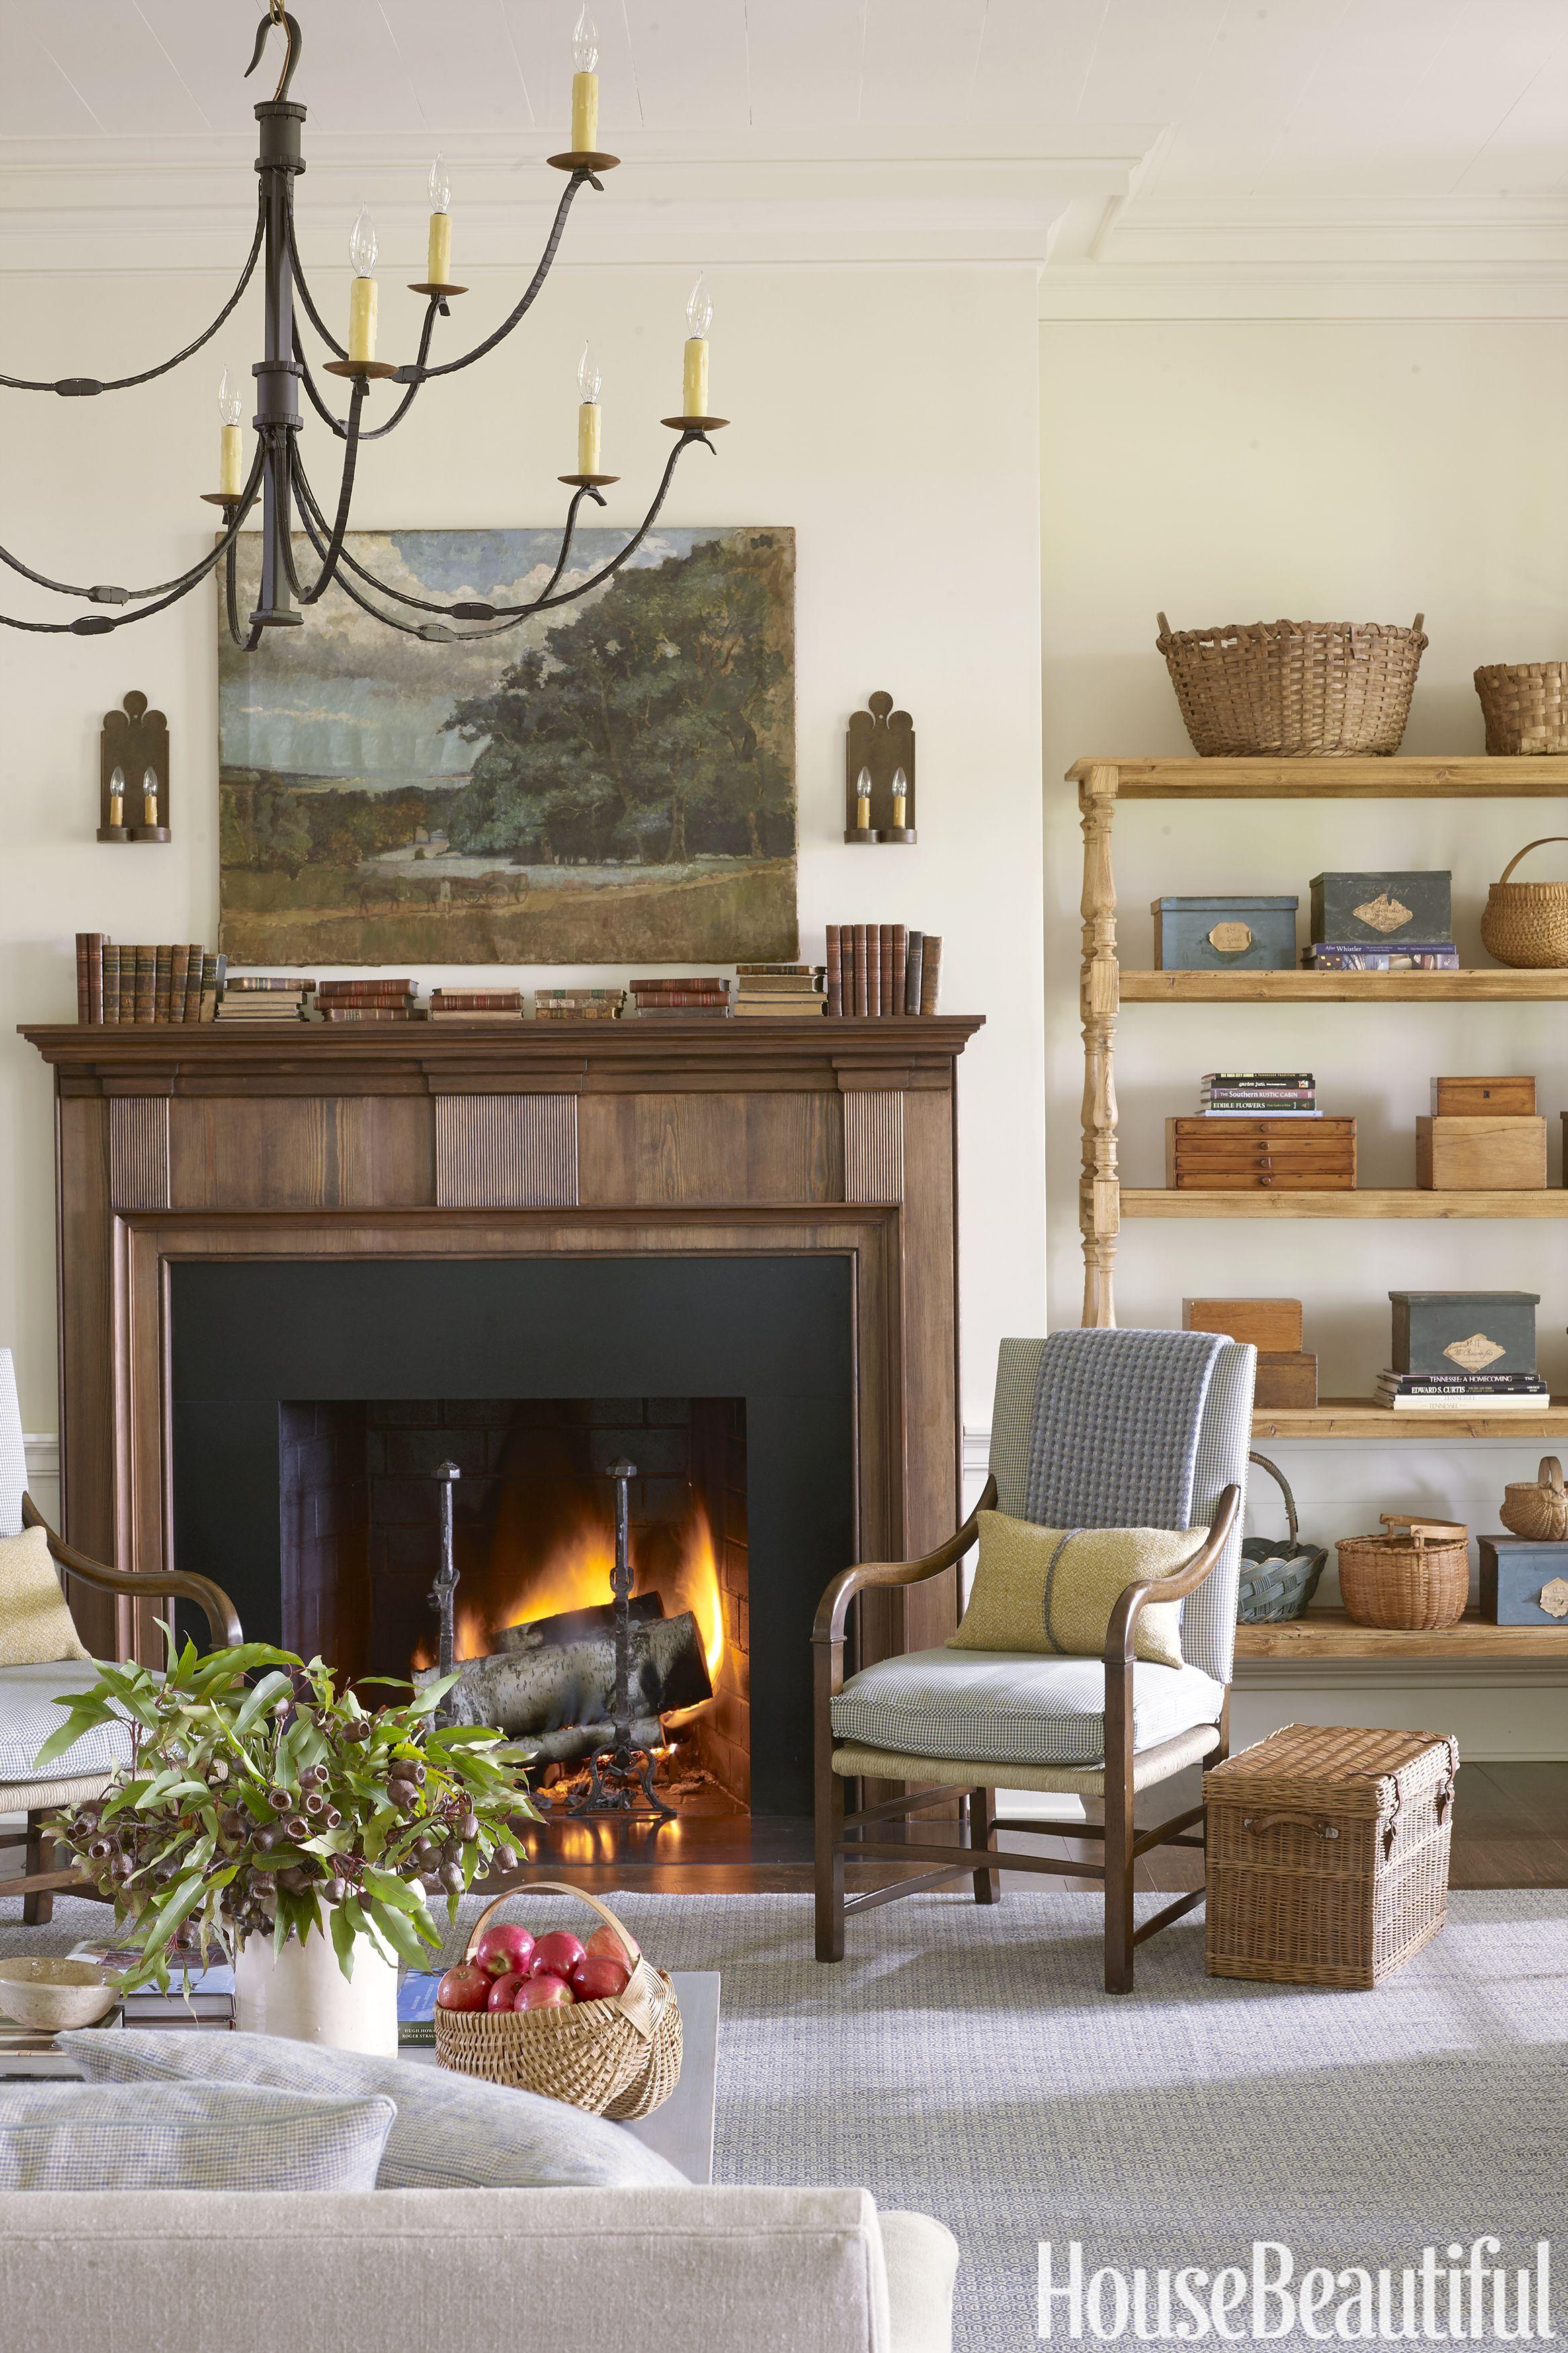 barbara westbrook living room & 70 Best Living Room Decorating Ideas \u0026 Designs - HouseBeautiful.com